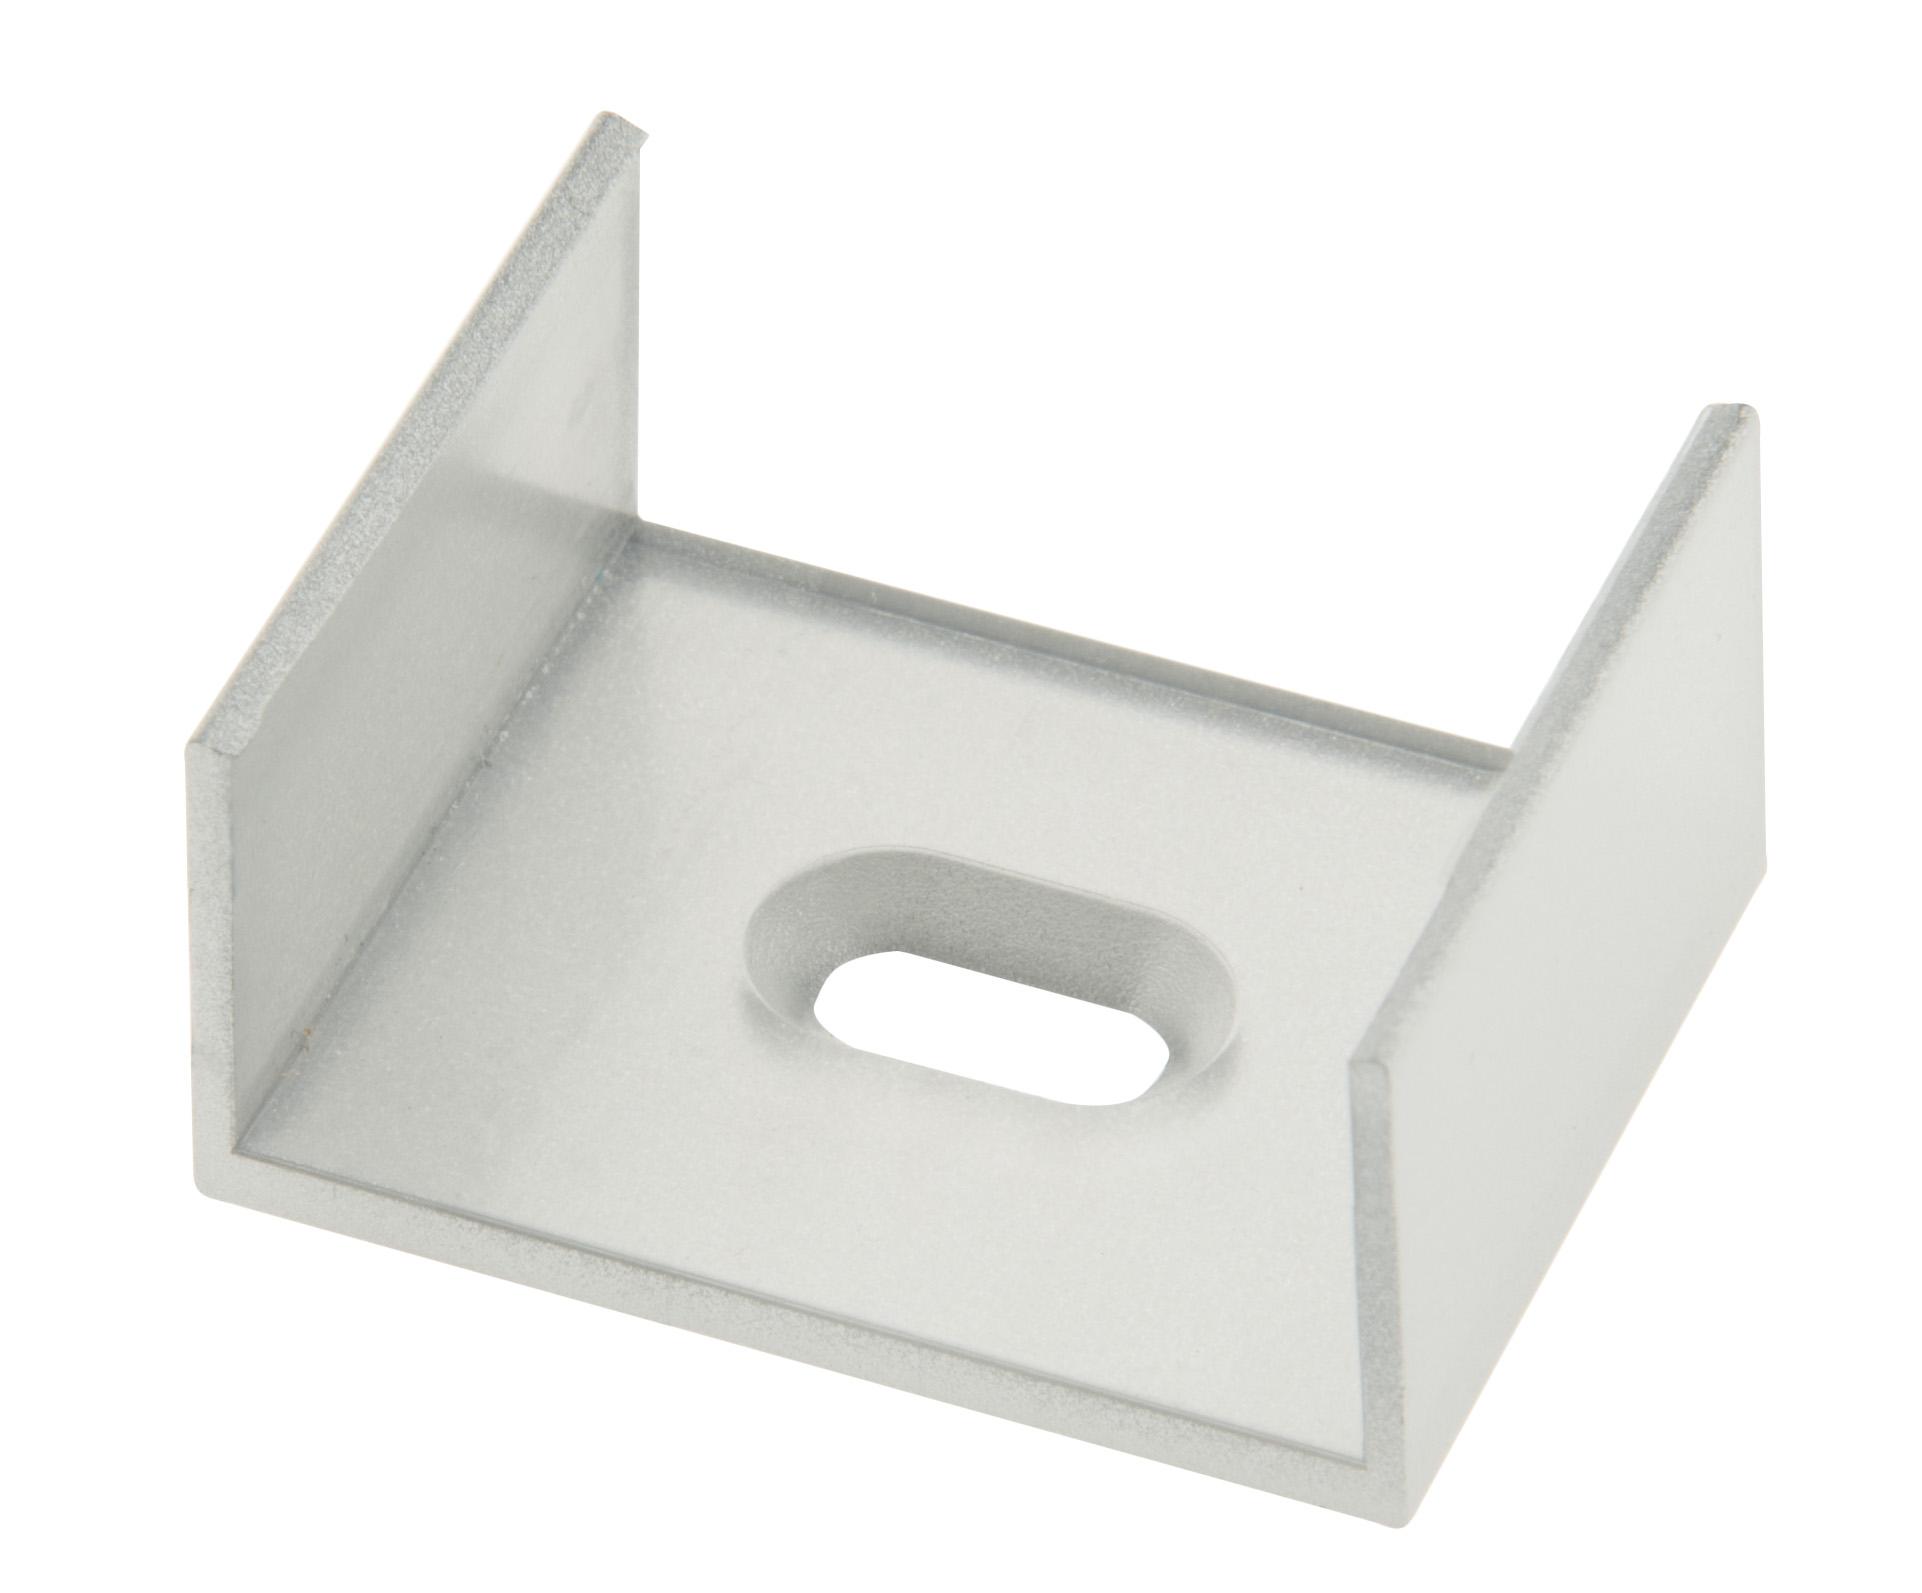 1 Stk CLF Montage Clip LIPZ005004